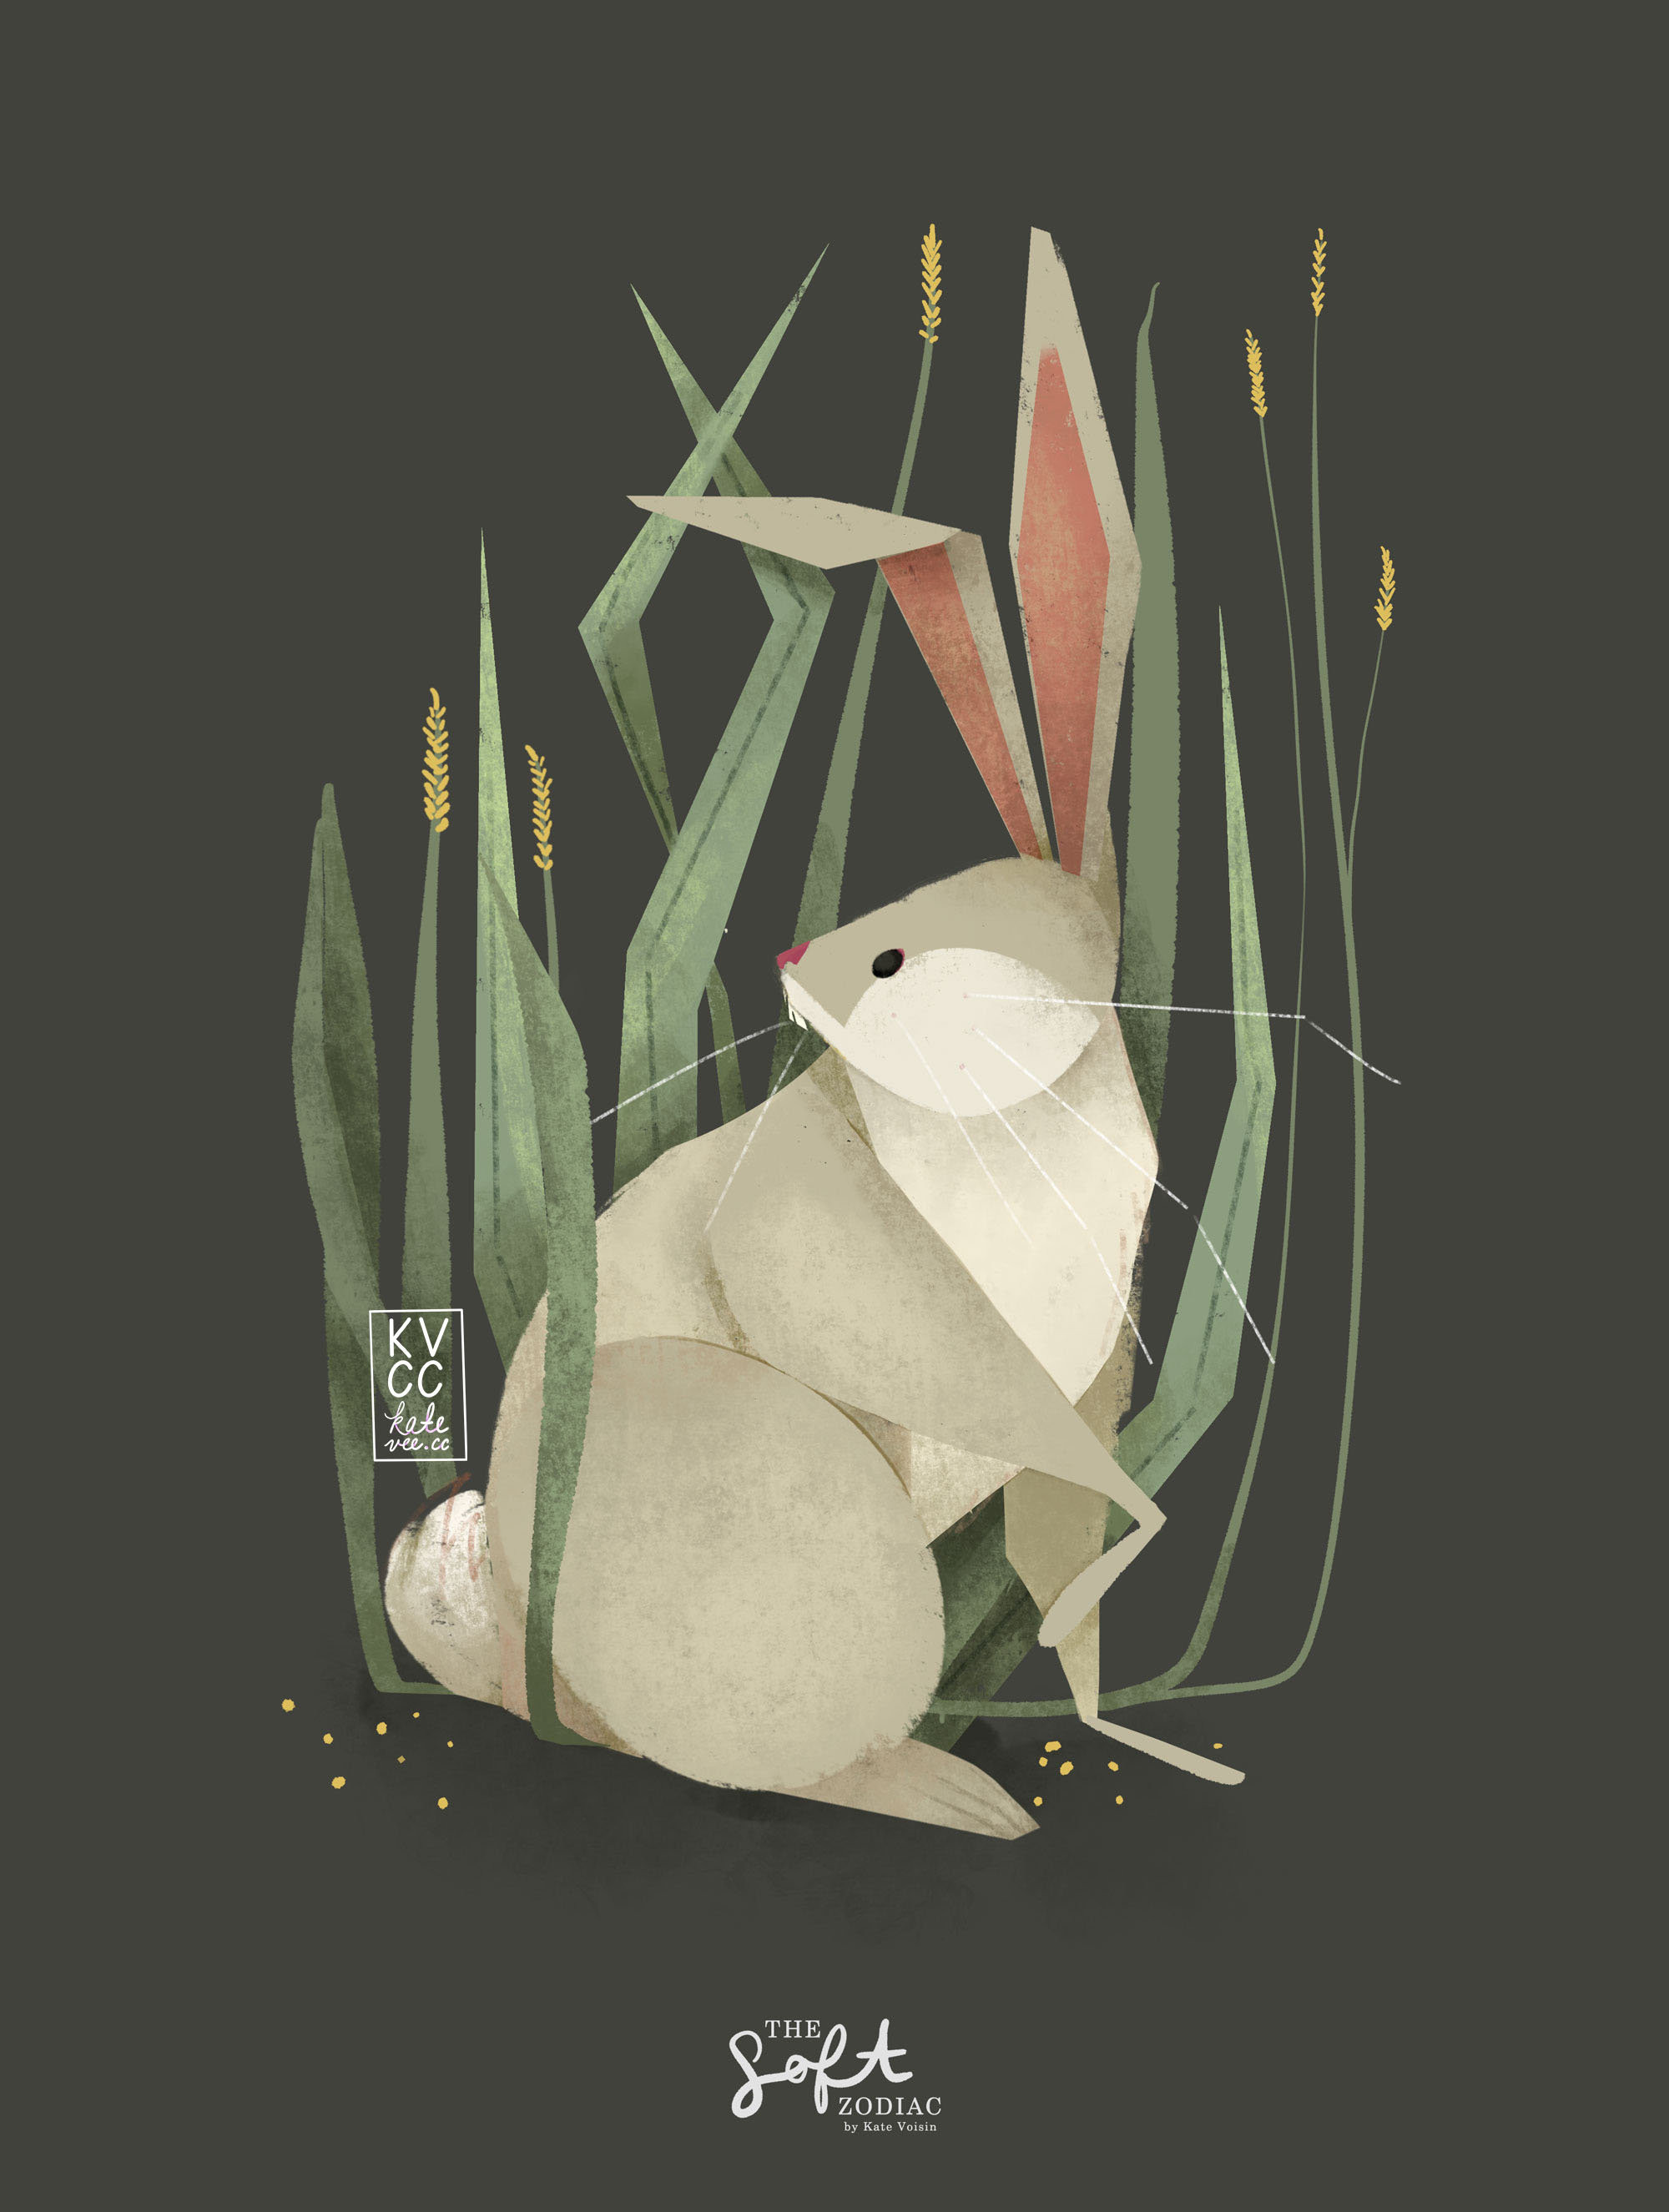 kvcc_rabbit.jpg